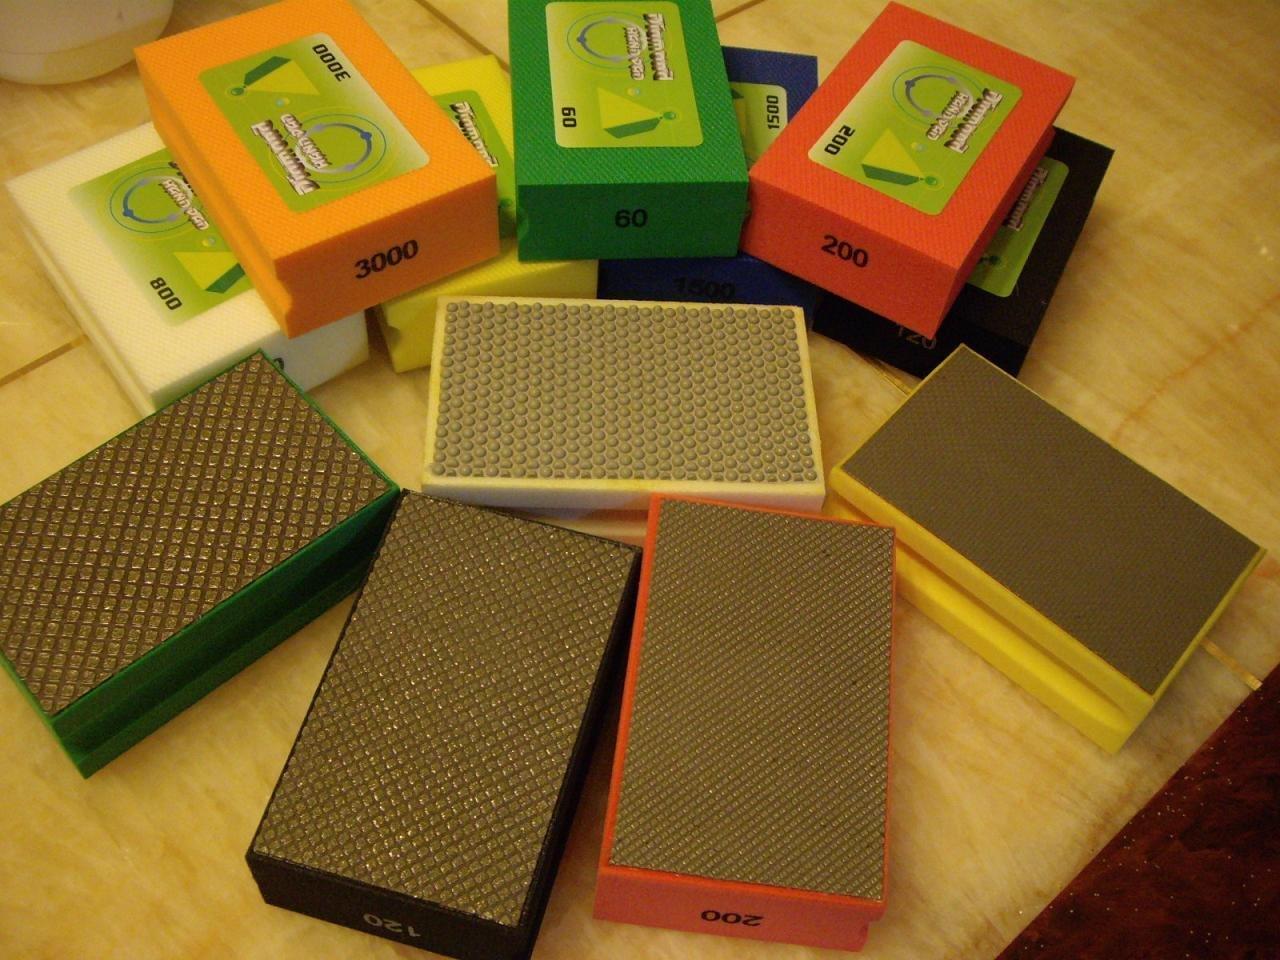 Diamond Hand Polishing Pads for Stone Concrete Granite Marble Glass Terrazzo - Set of 7 Pcs